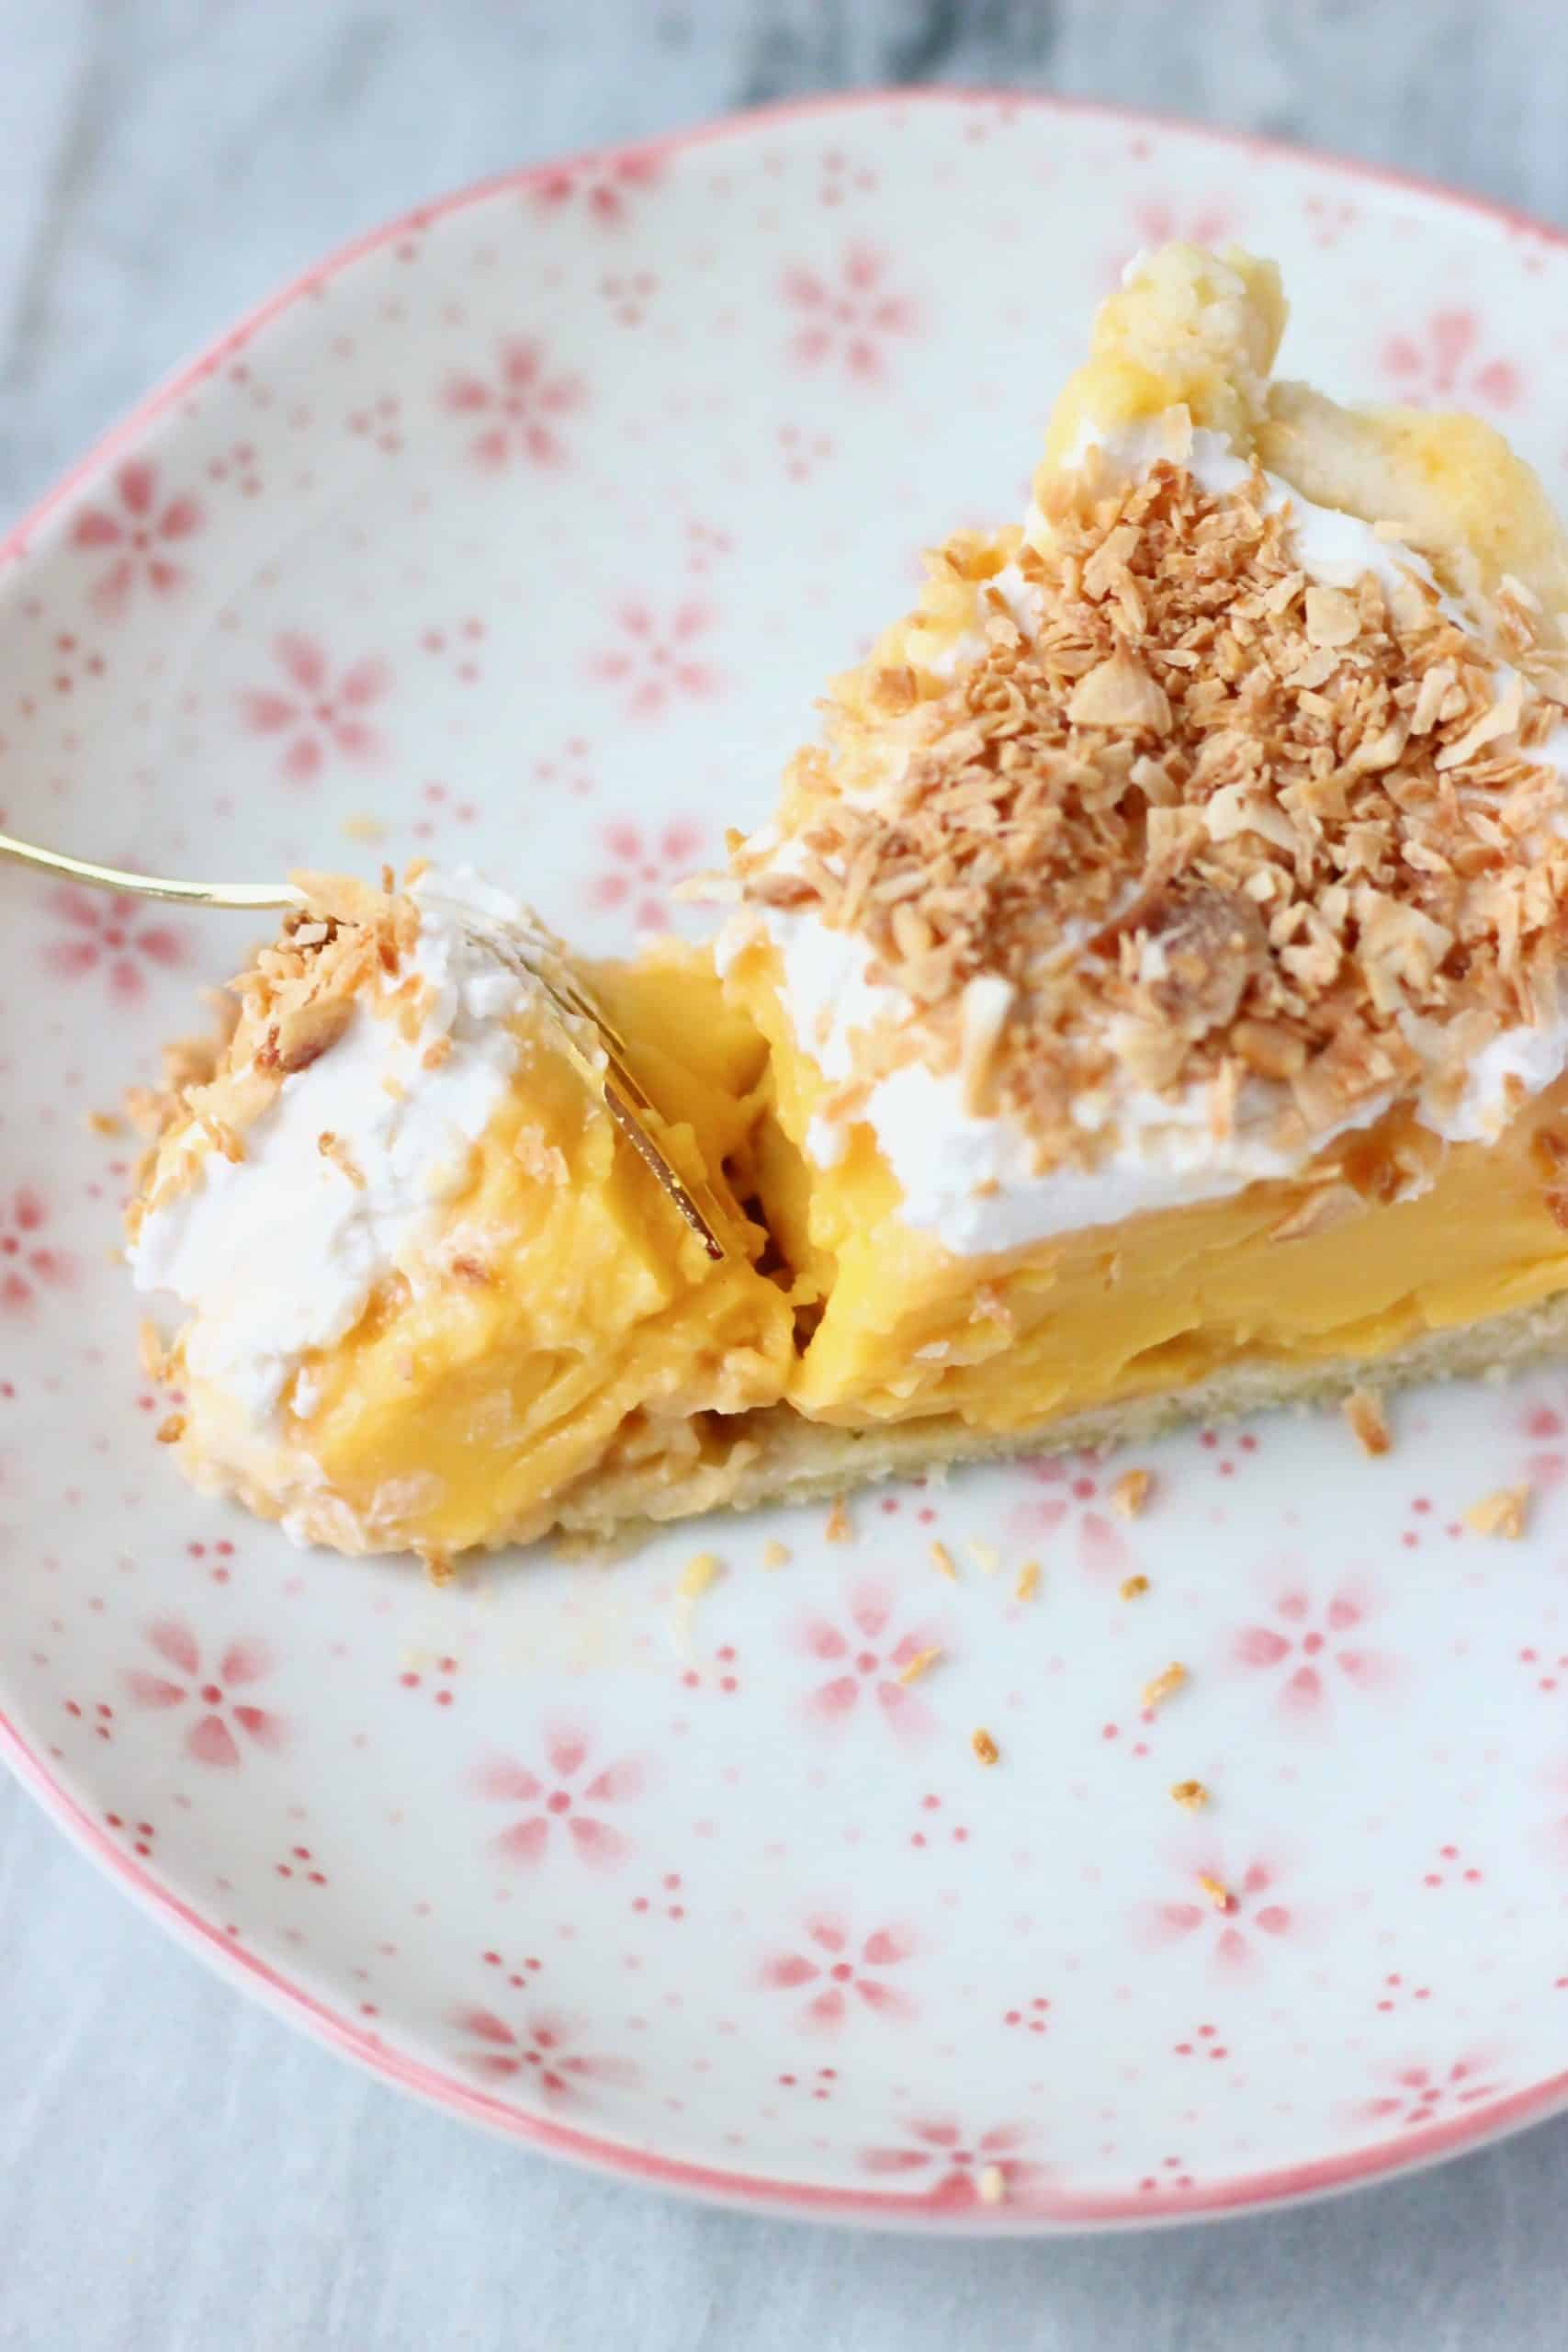 A slice of gluten-free vegan coconut cream pie with custard, cream and desiccated coconut